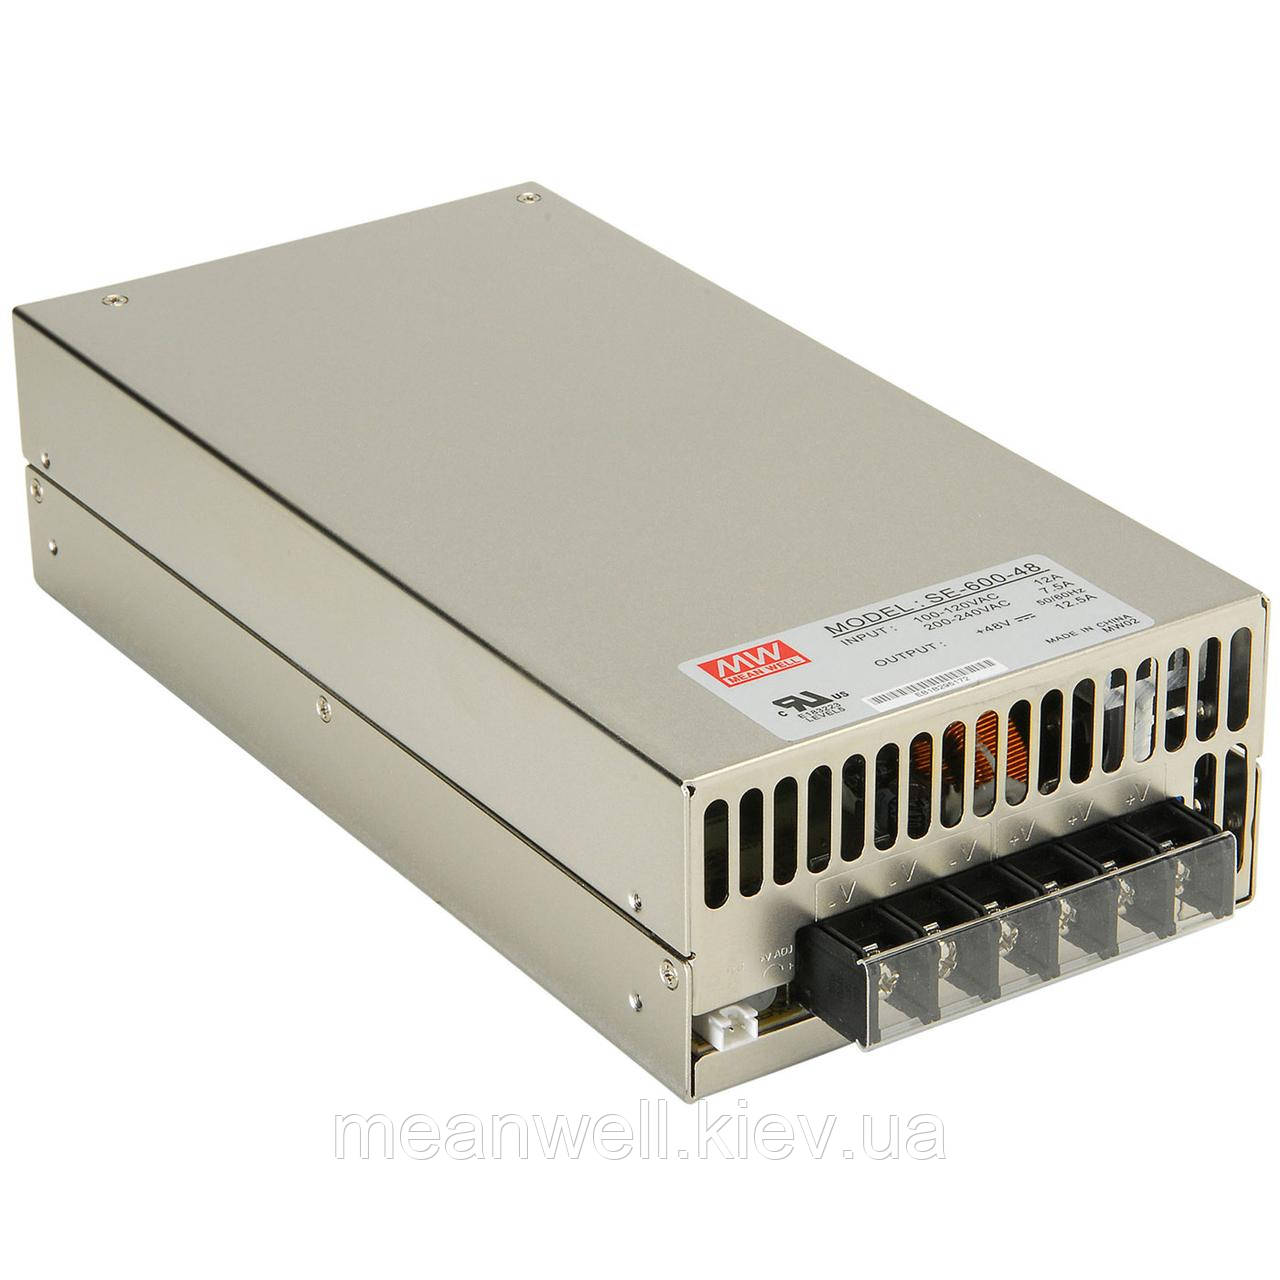 SE-600-36 Блок питания Mean Well 597.6 вт,36 в, 16.6 А